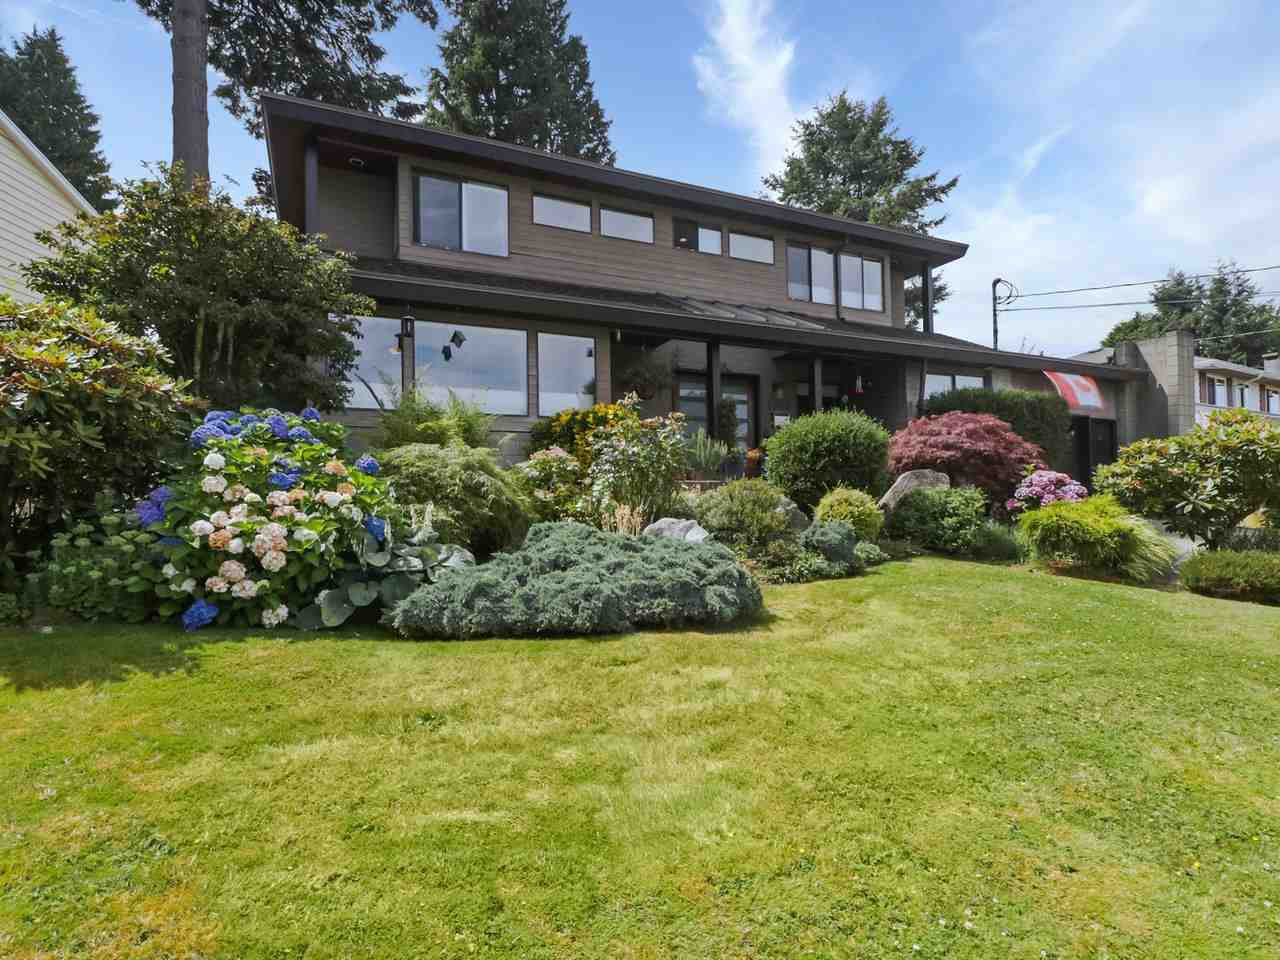 Main Photo: 1059 WALALEE Drive in Delta: English Bluff House for sale (Tsawwassen)  : MLS®# R2480935